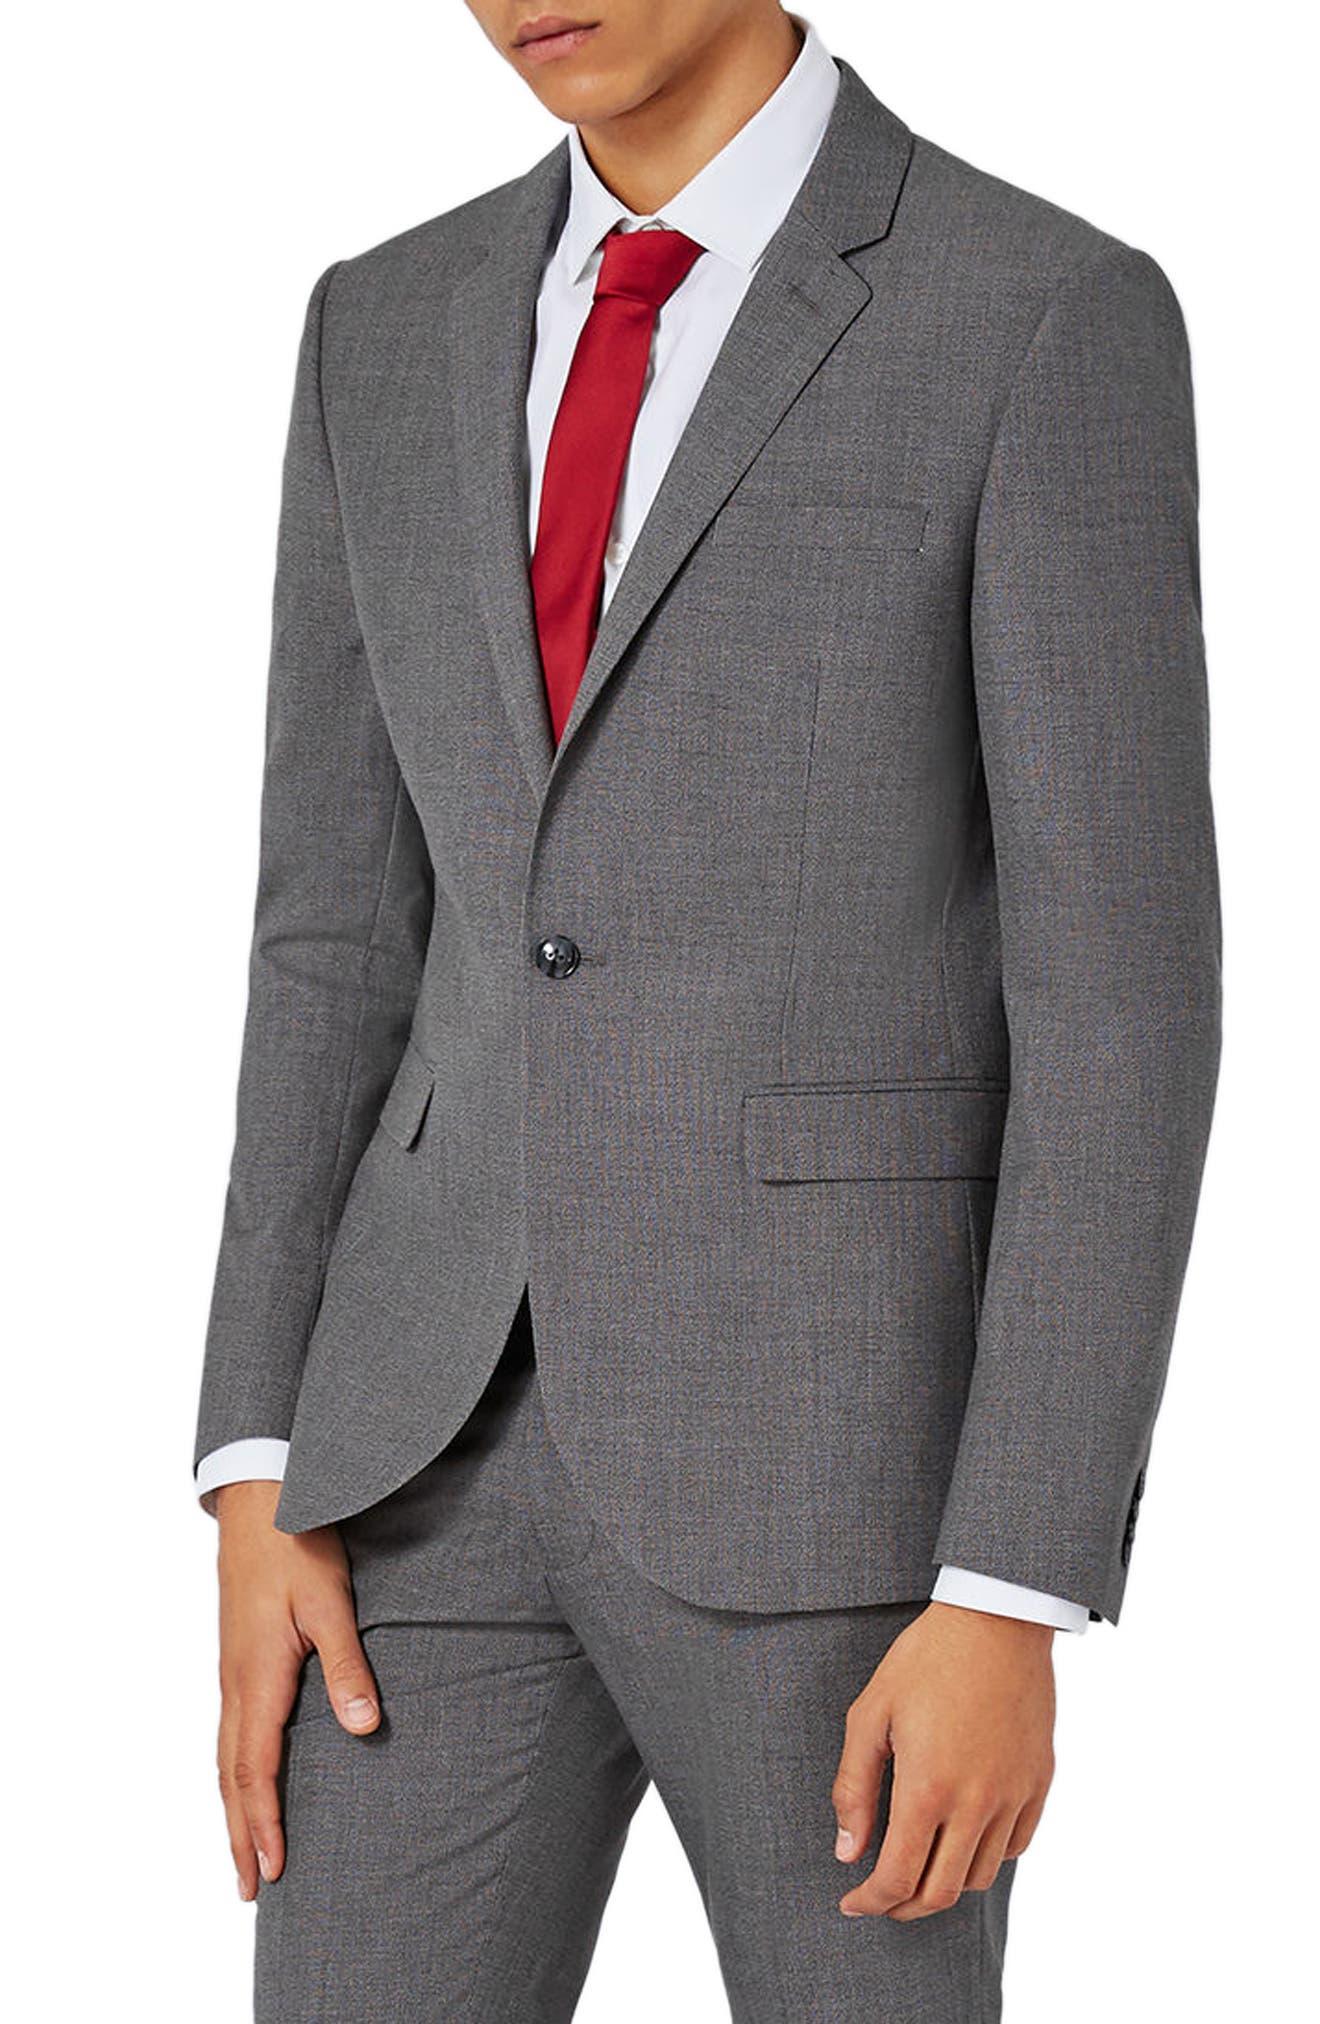 Topman Textured Skinny Fit Suit Jacket